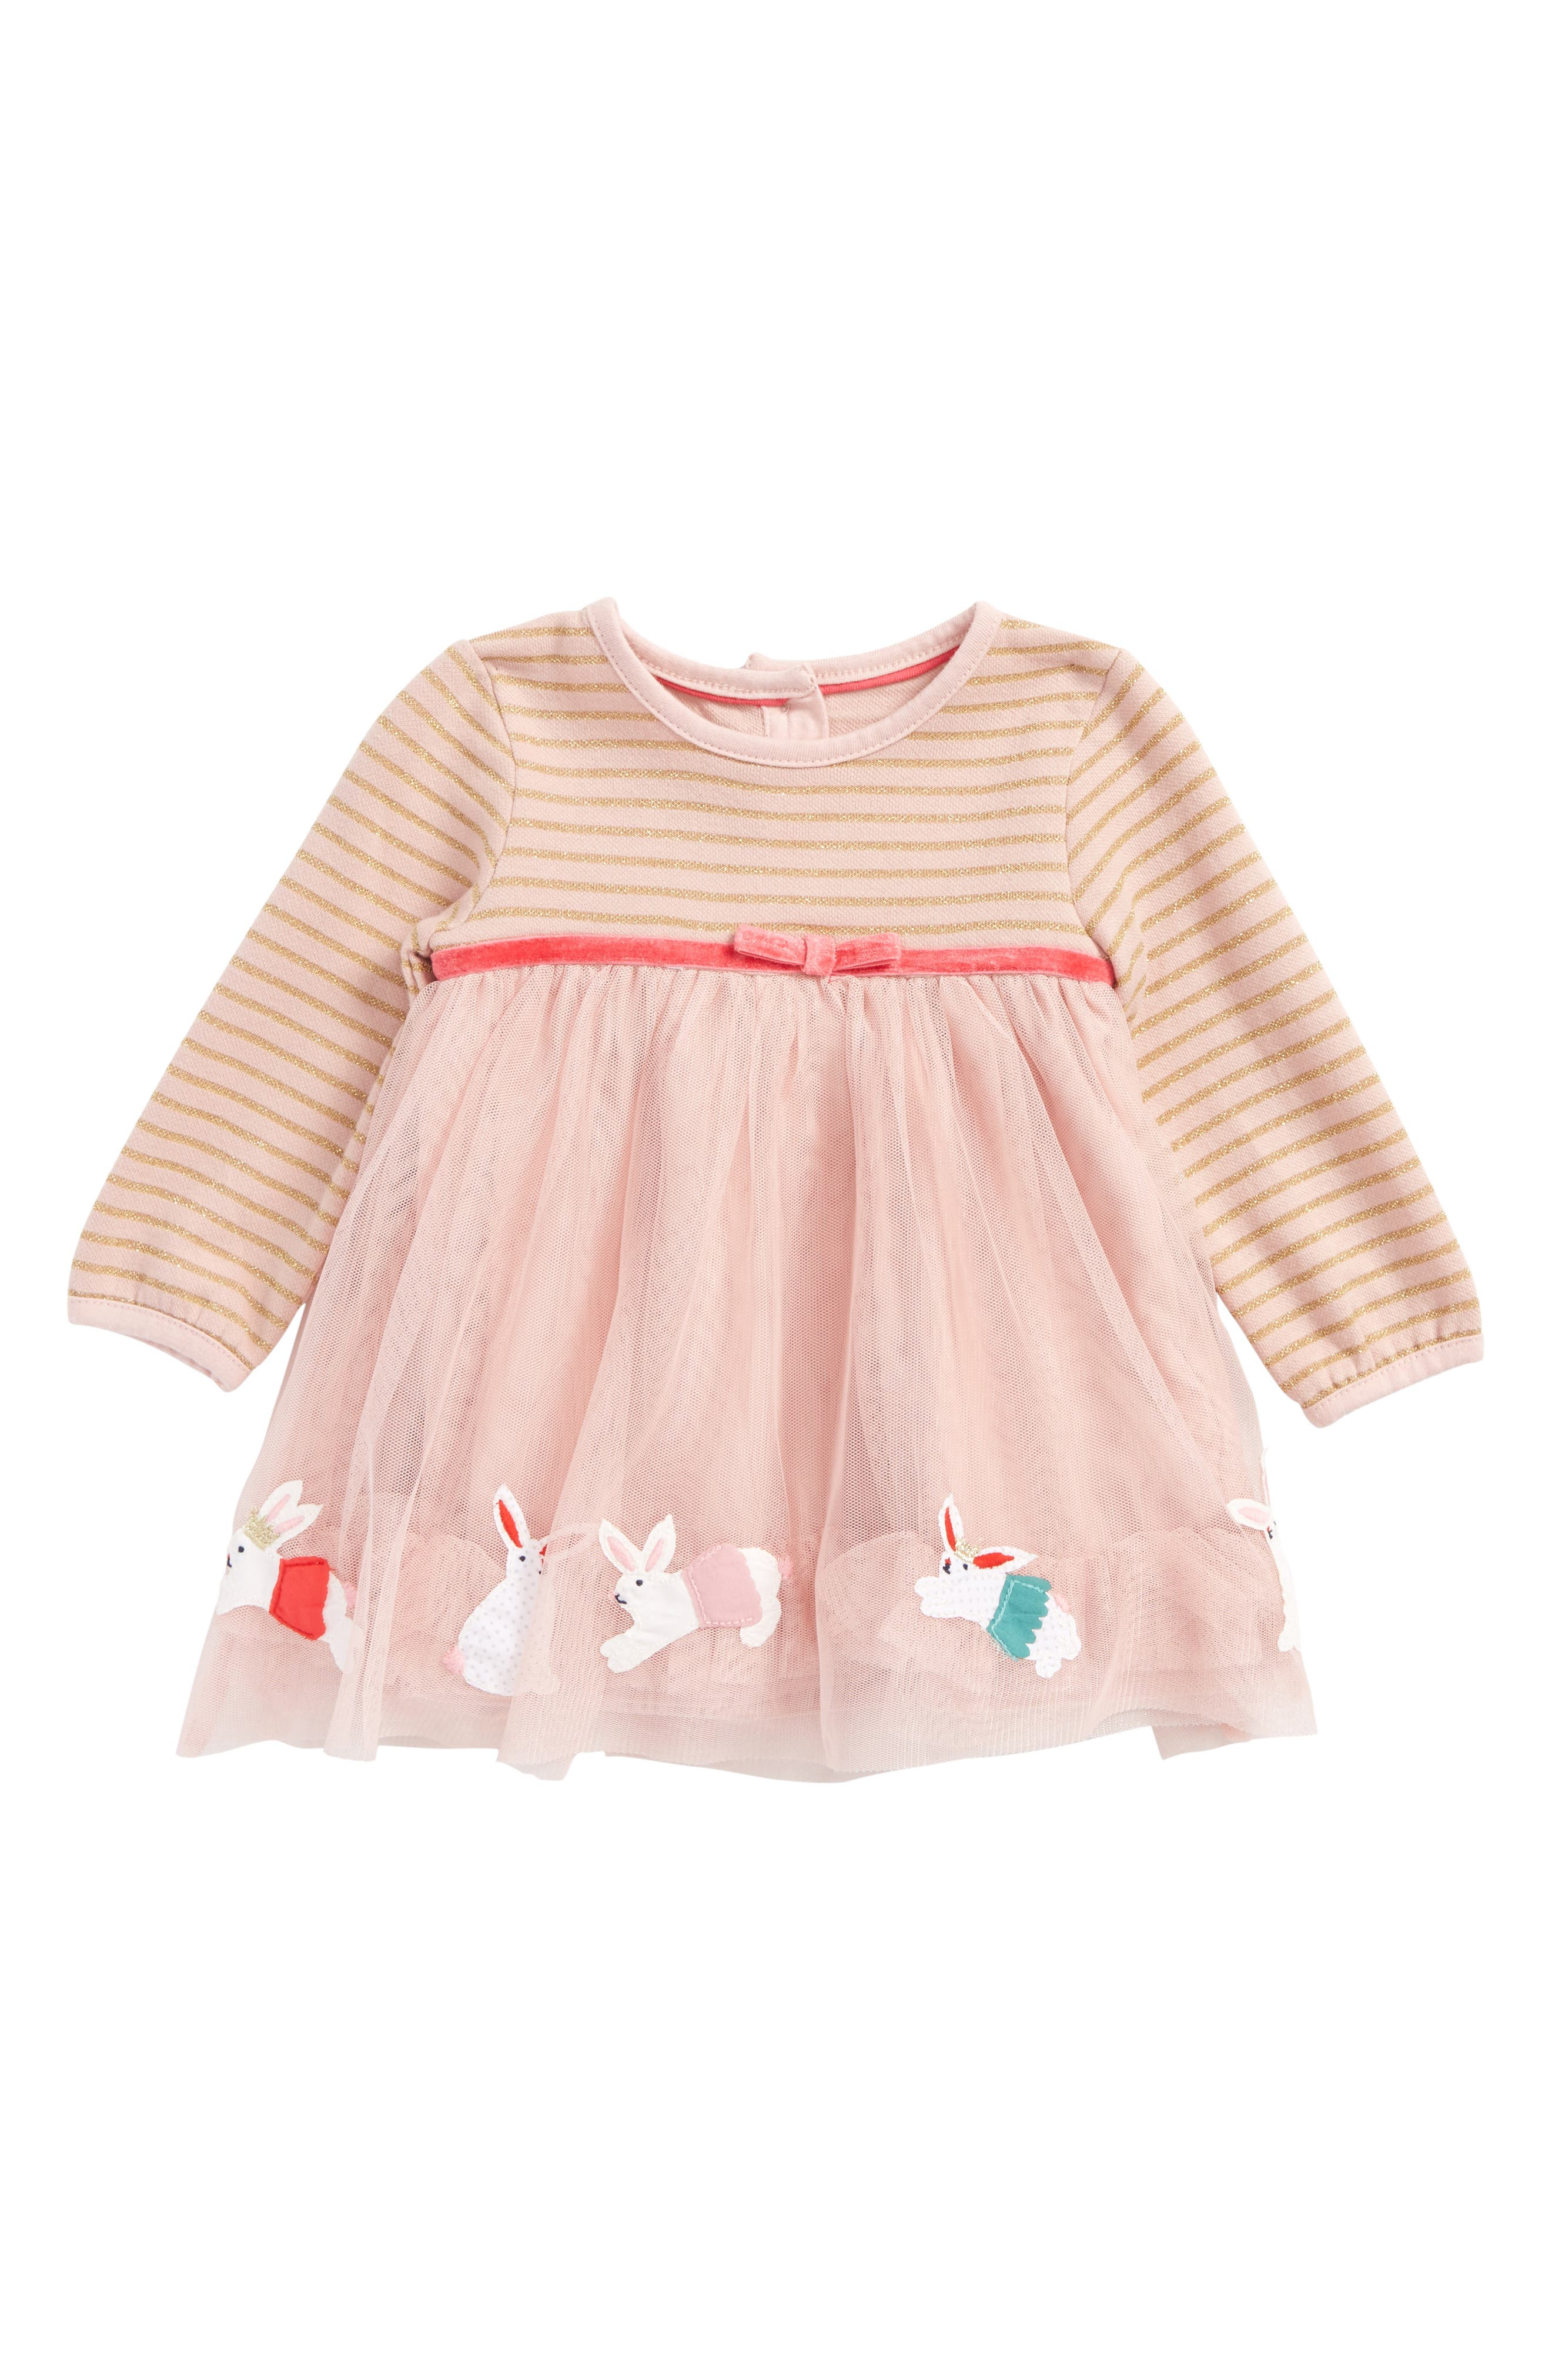 Appliqué Mixed Media Dress,                             Main thumbnail 1, color,                             Milkshake Pink Bunnies